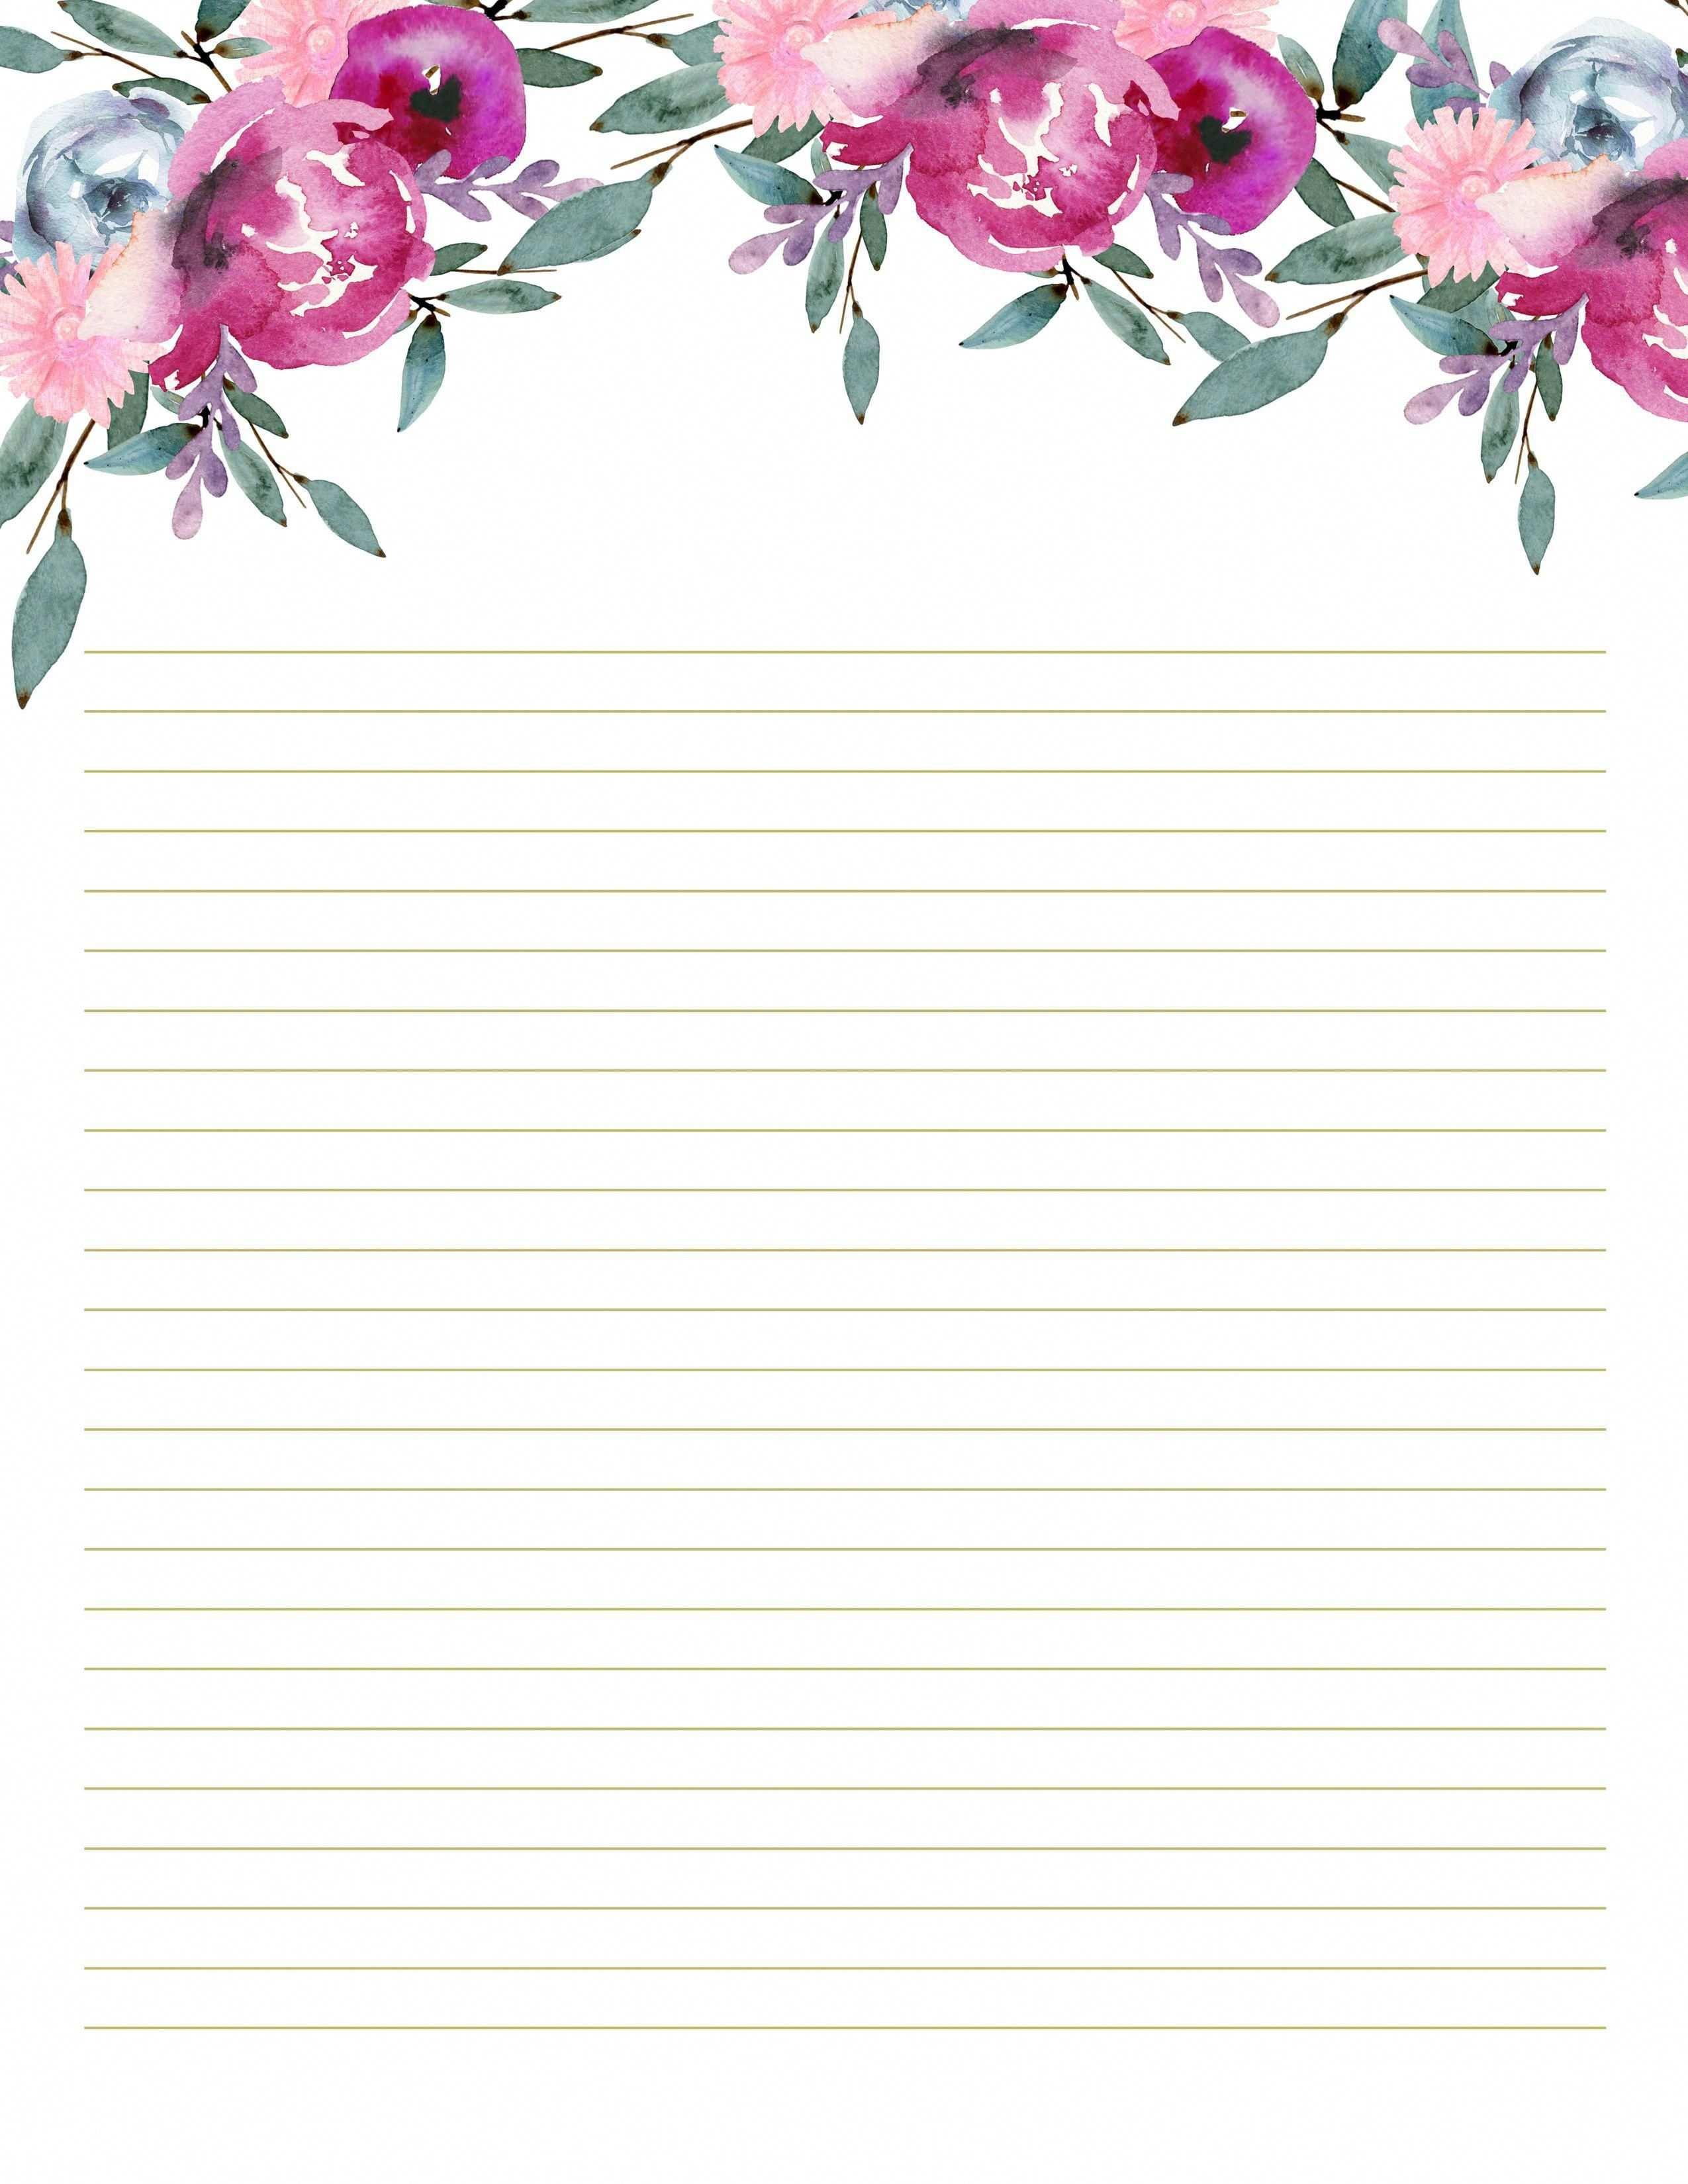 Stationery Printables For Diy Planner Scrapbookkitsetsy